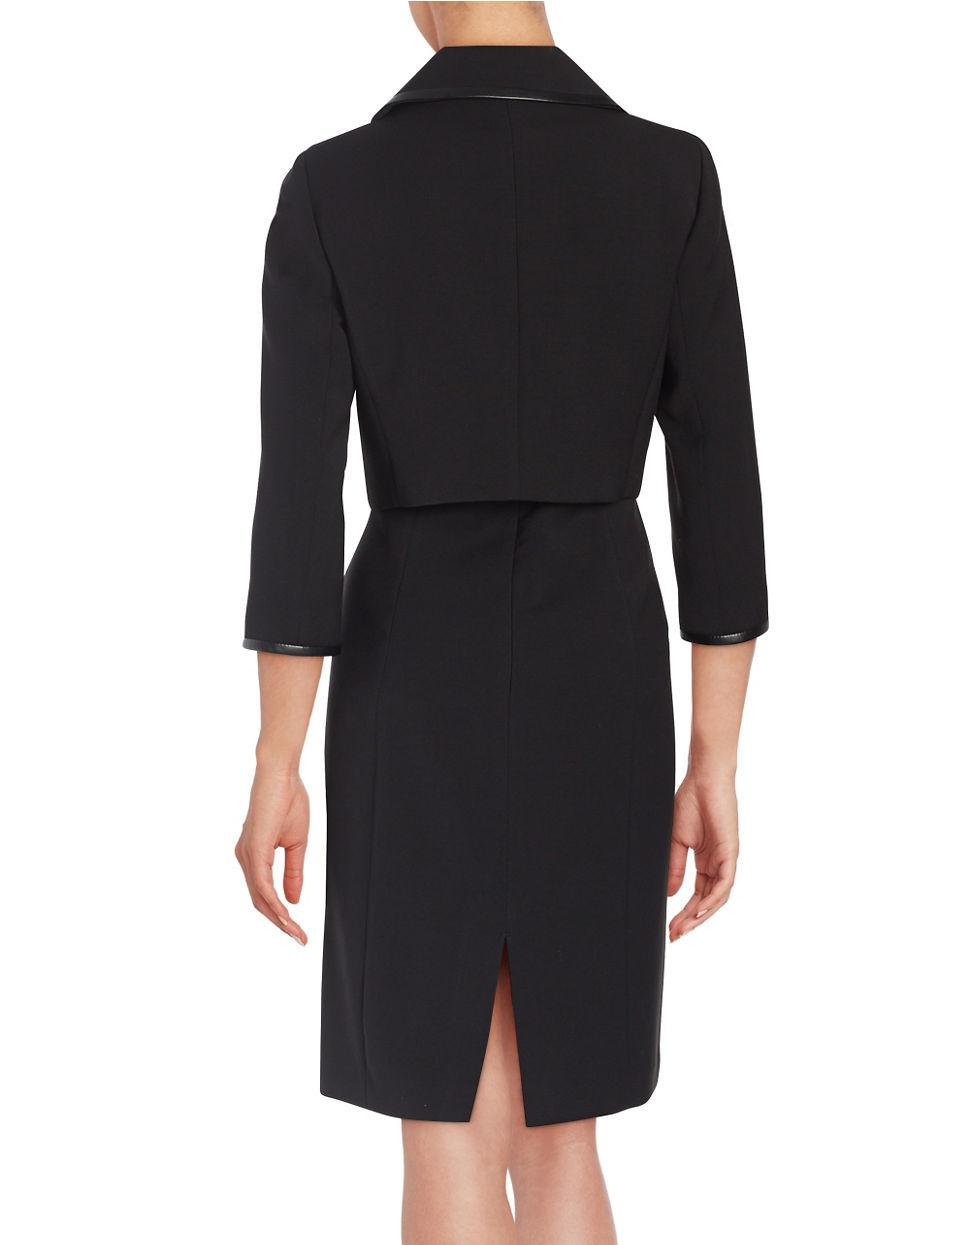 Tahari Petite Pencil Dress And Jacket Suit in Black | Lyst